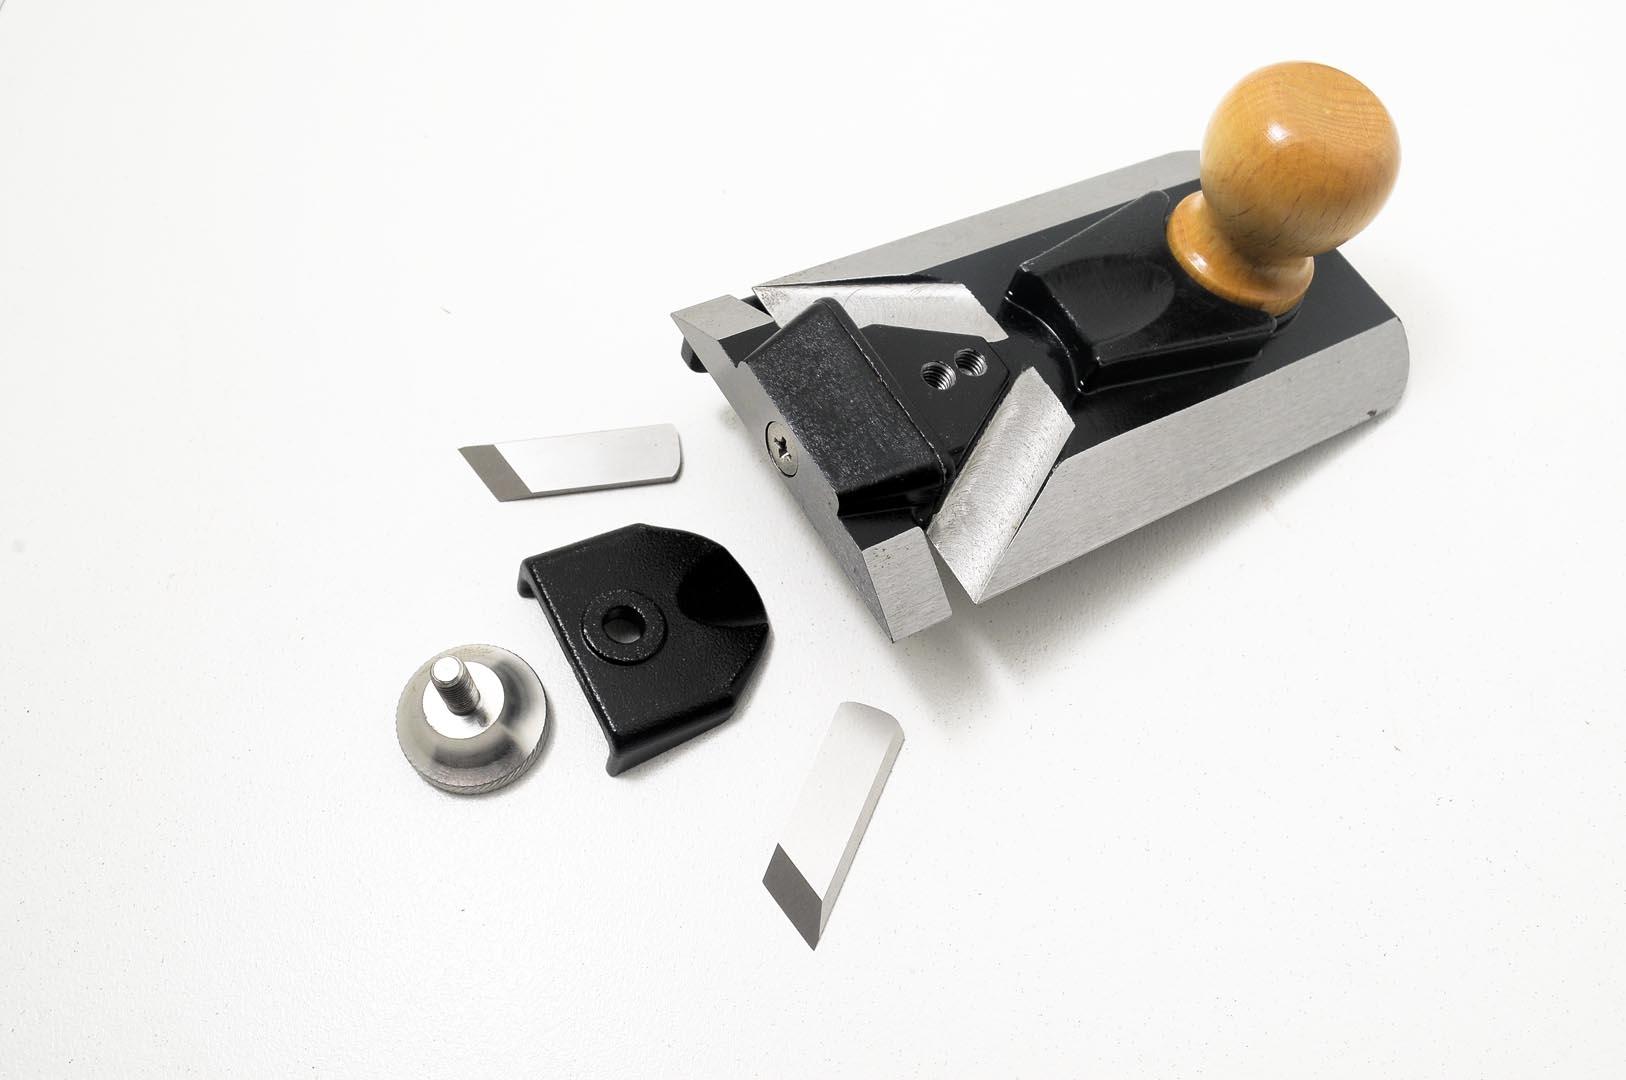 151239-Cepillo limpia canaleta rebaja machihembrado WoodRiver 151239-max-5.